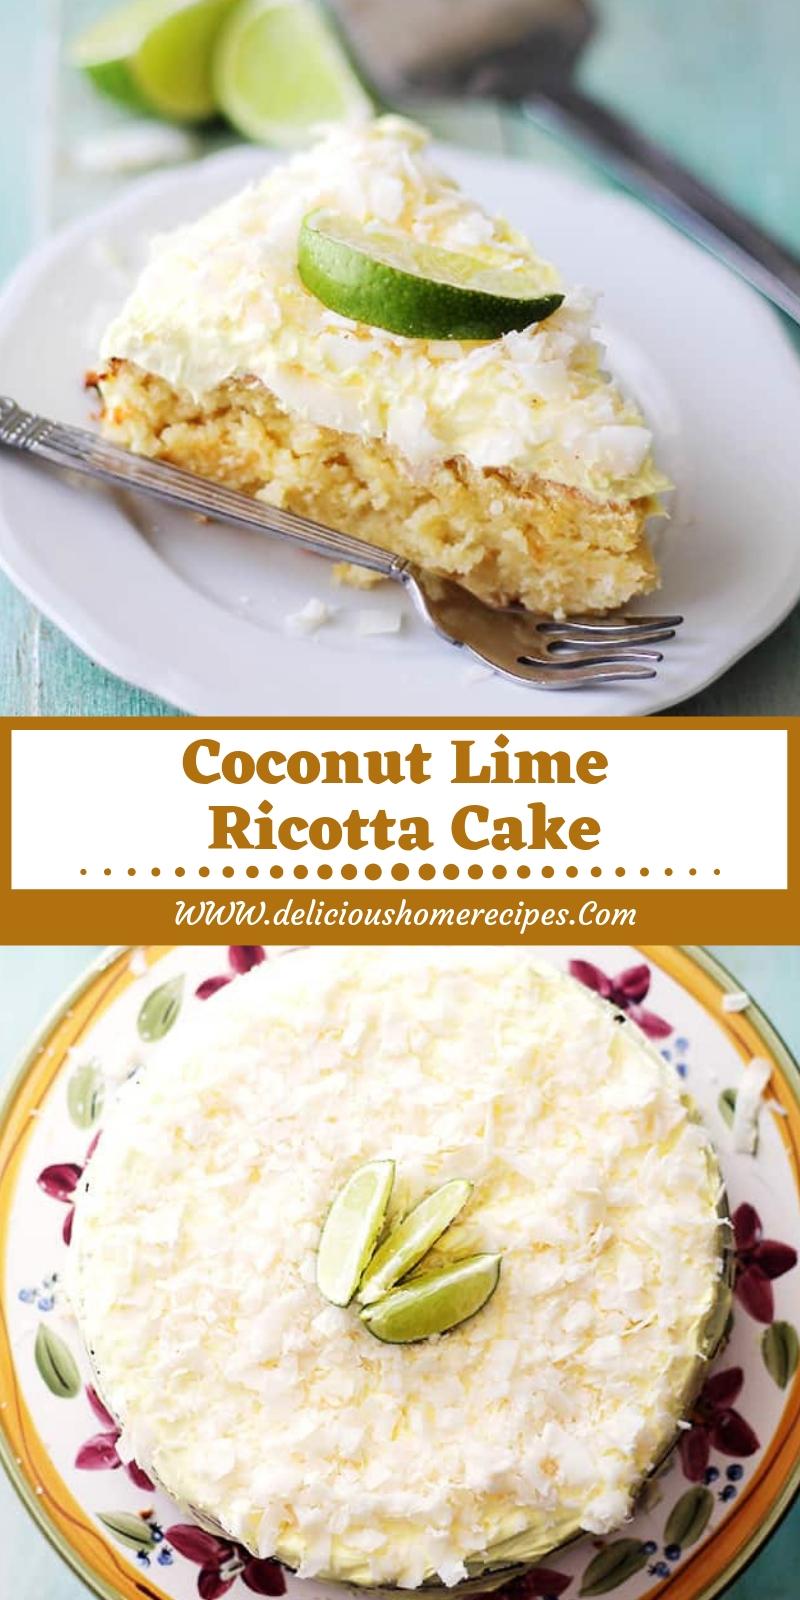 Coconut Lime Ricotta Cake